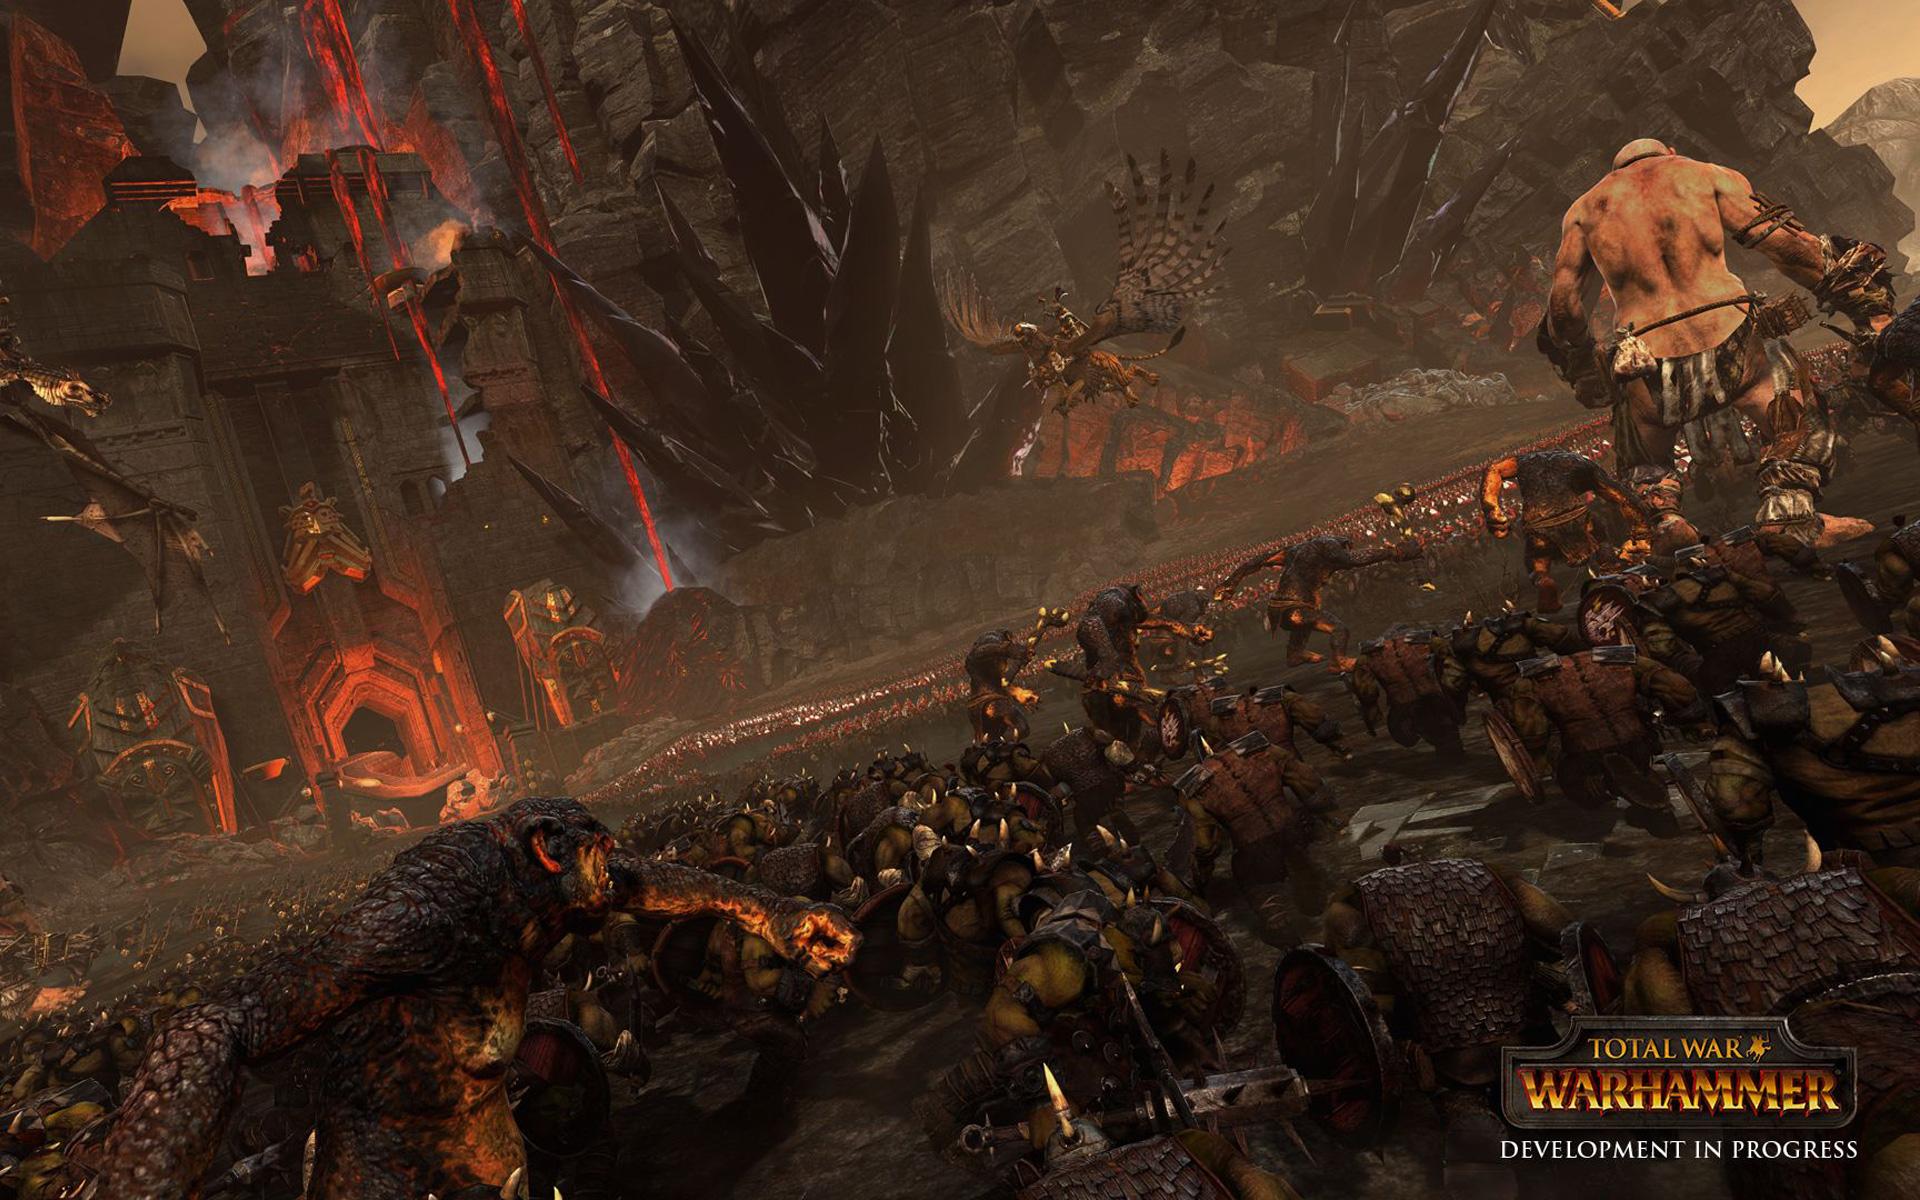 Total War Warhammer Wallpaper in 1920x1200 1920x1200